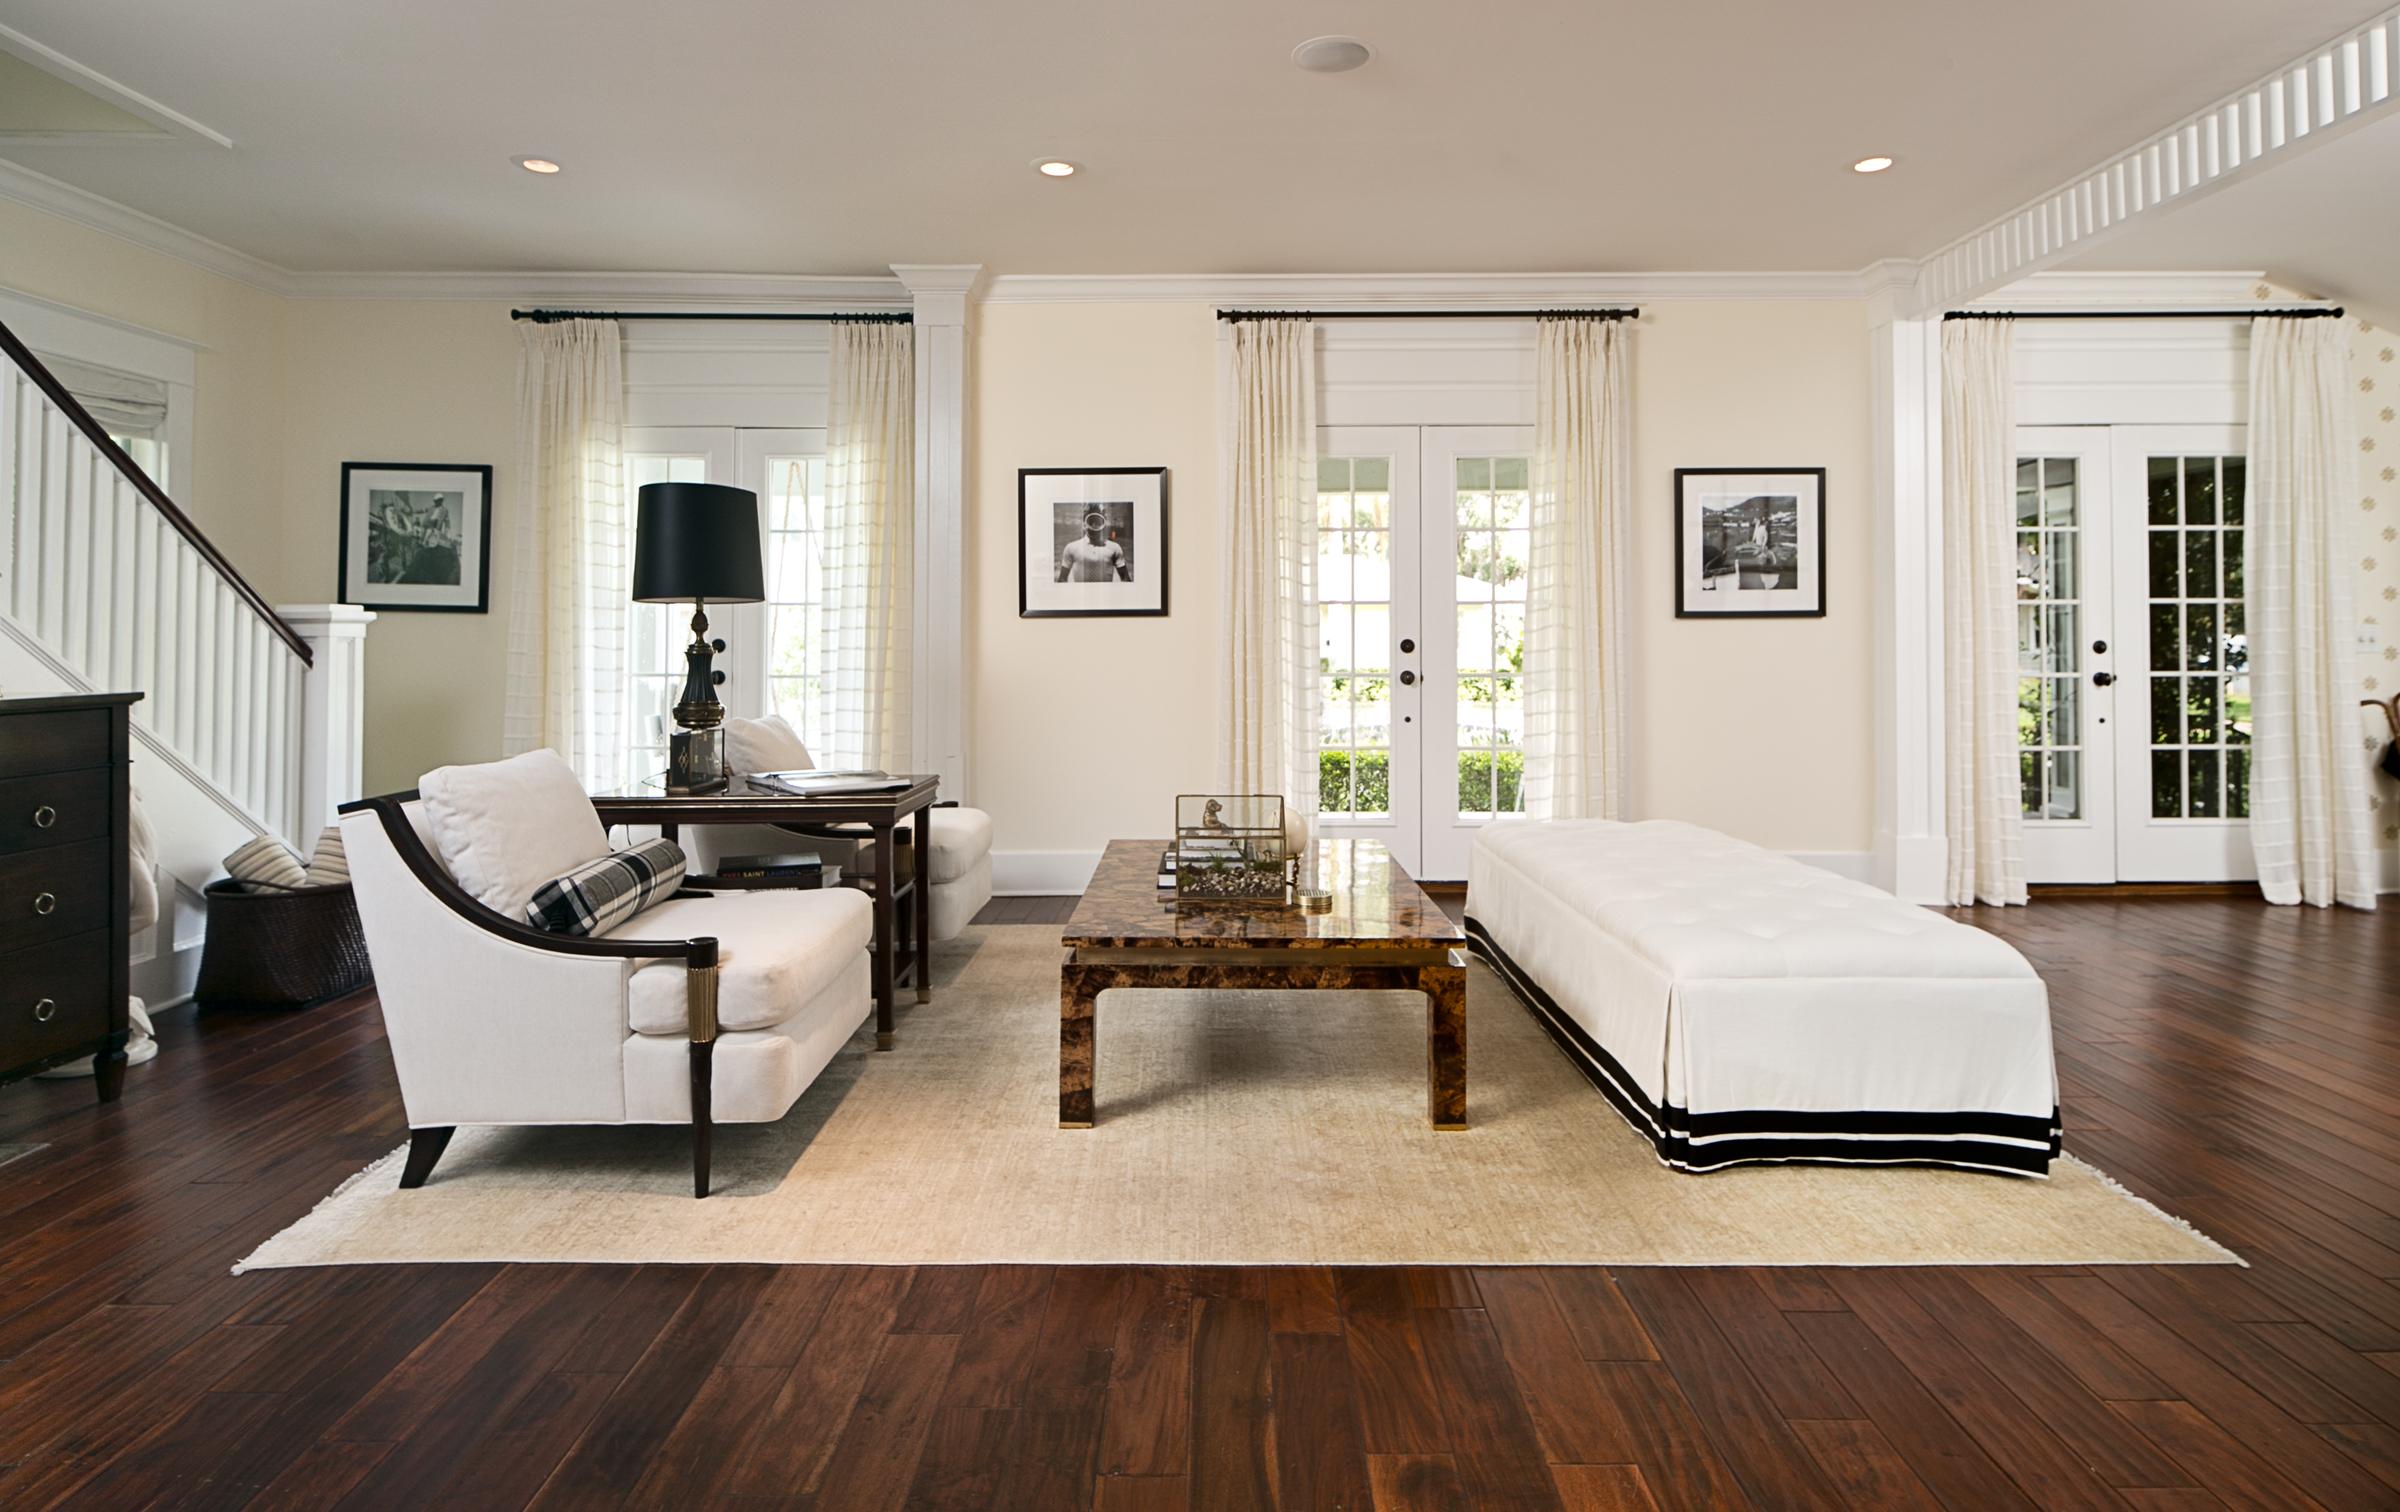 historic_interiordesign_lisagilmoredesign5